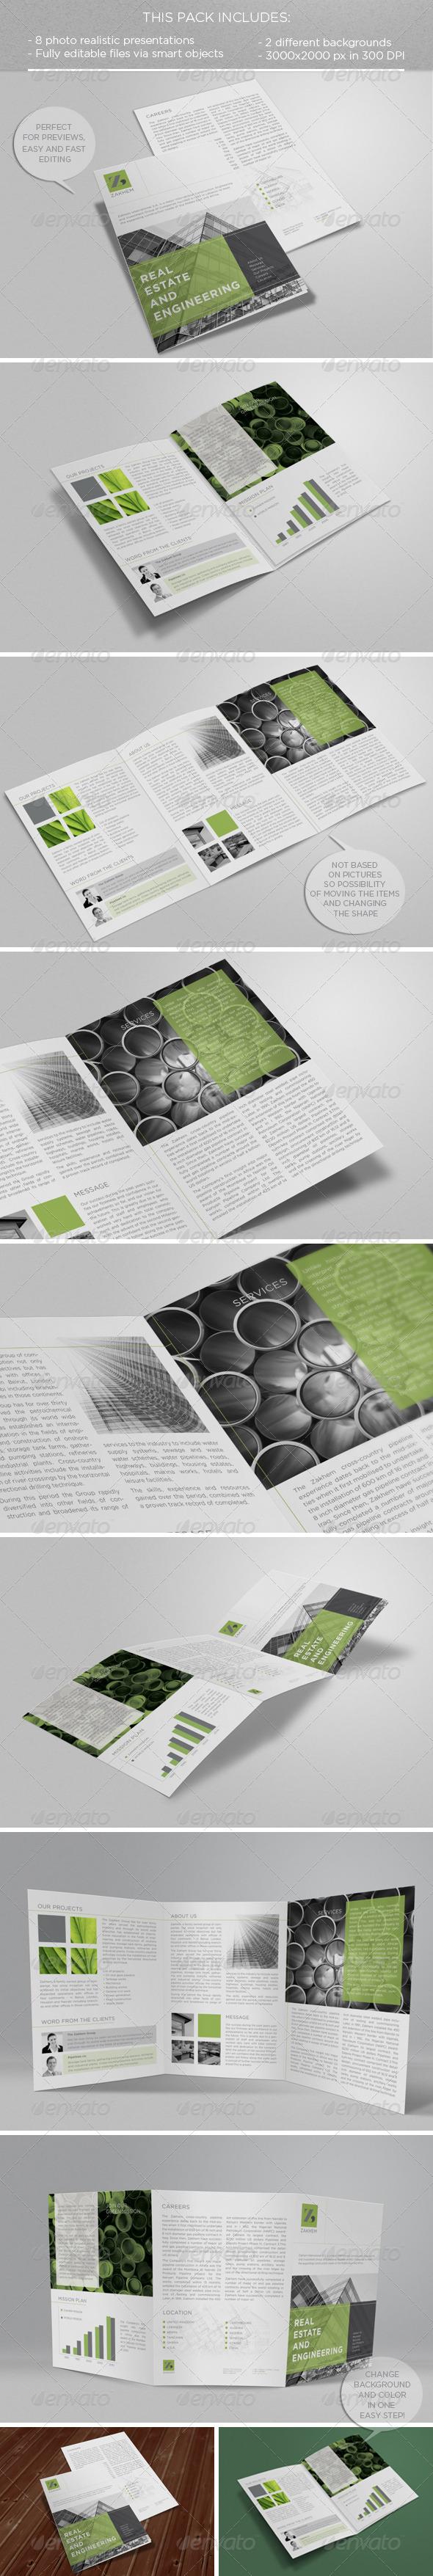 GraphicRiver A4 Tri-Fold Brochure Mock-up 6004990